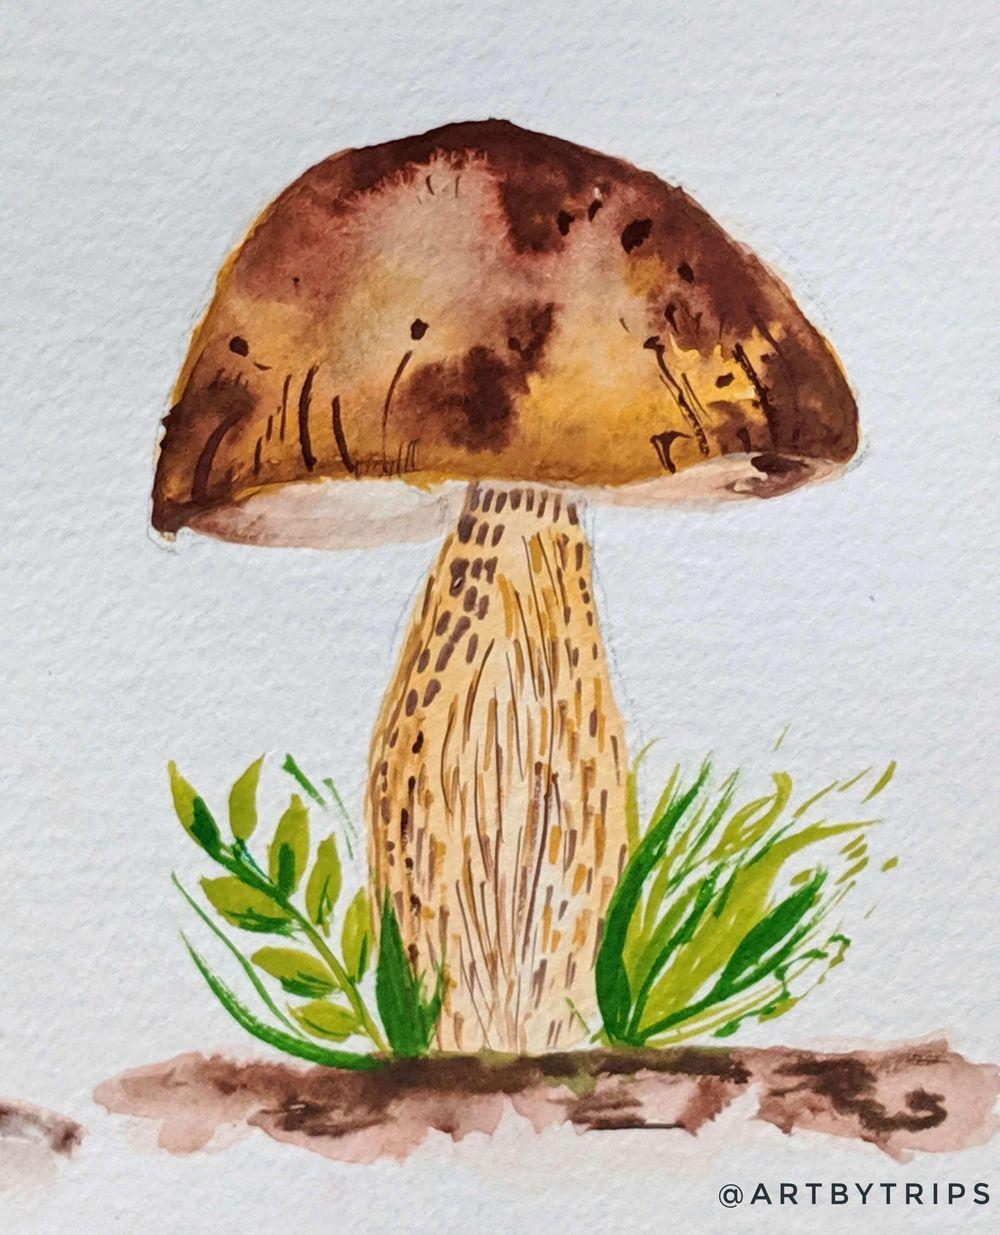 Love Mushrooms :-) - image 5 - student project